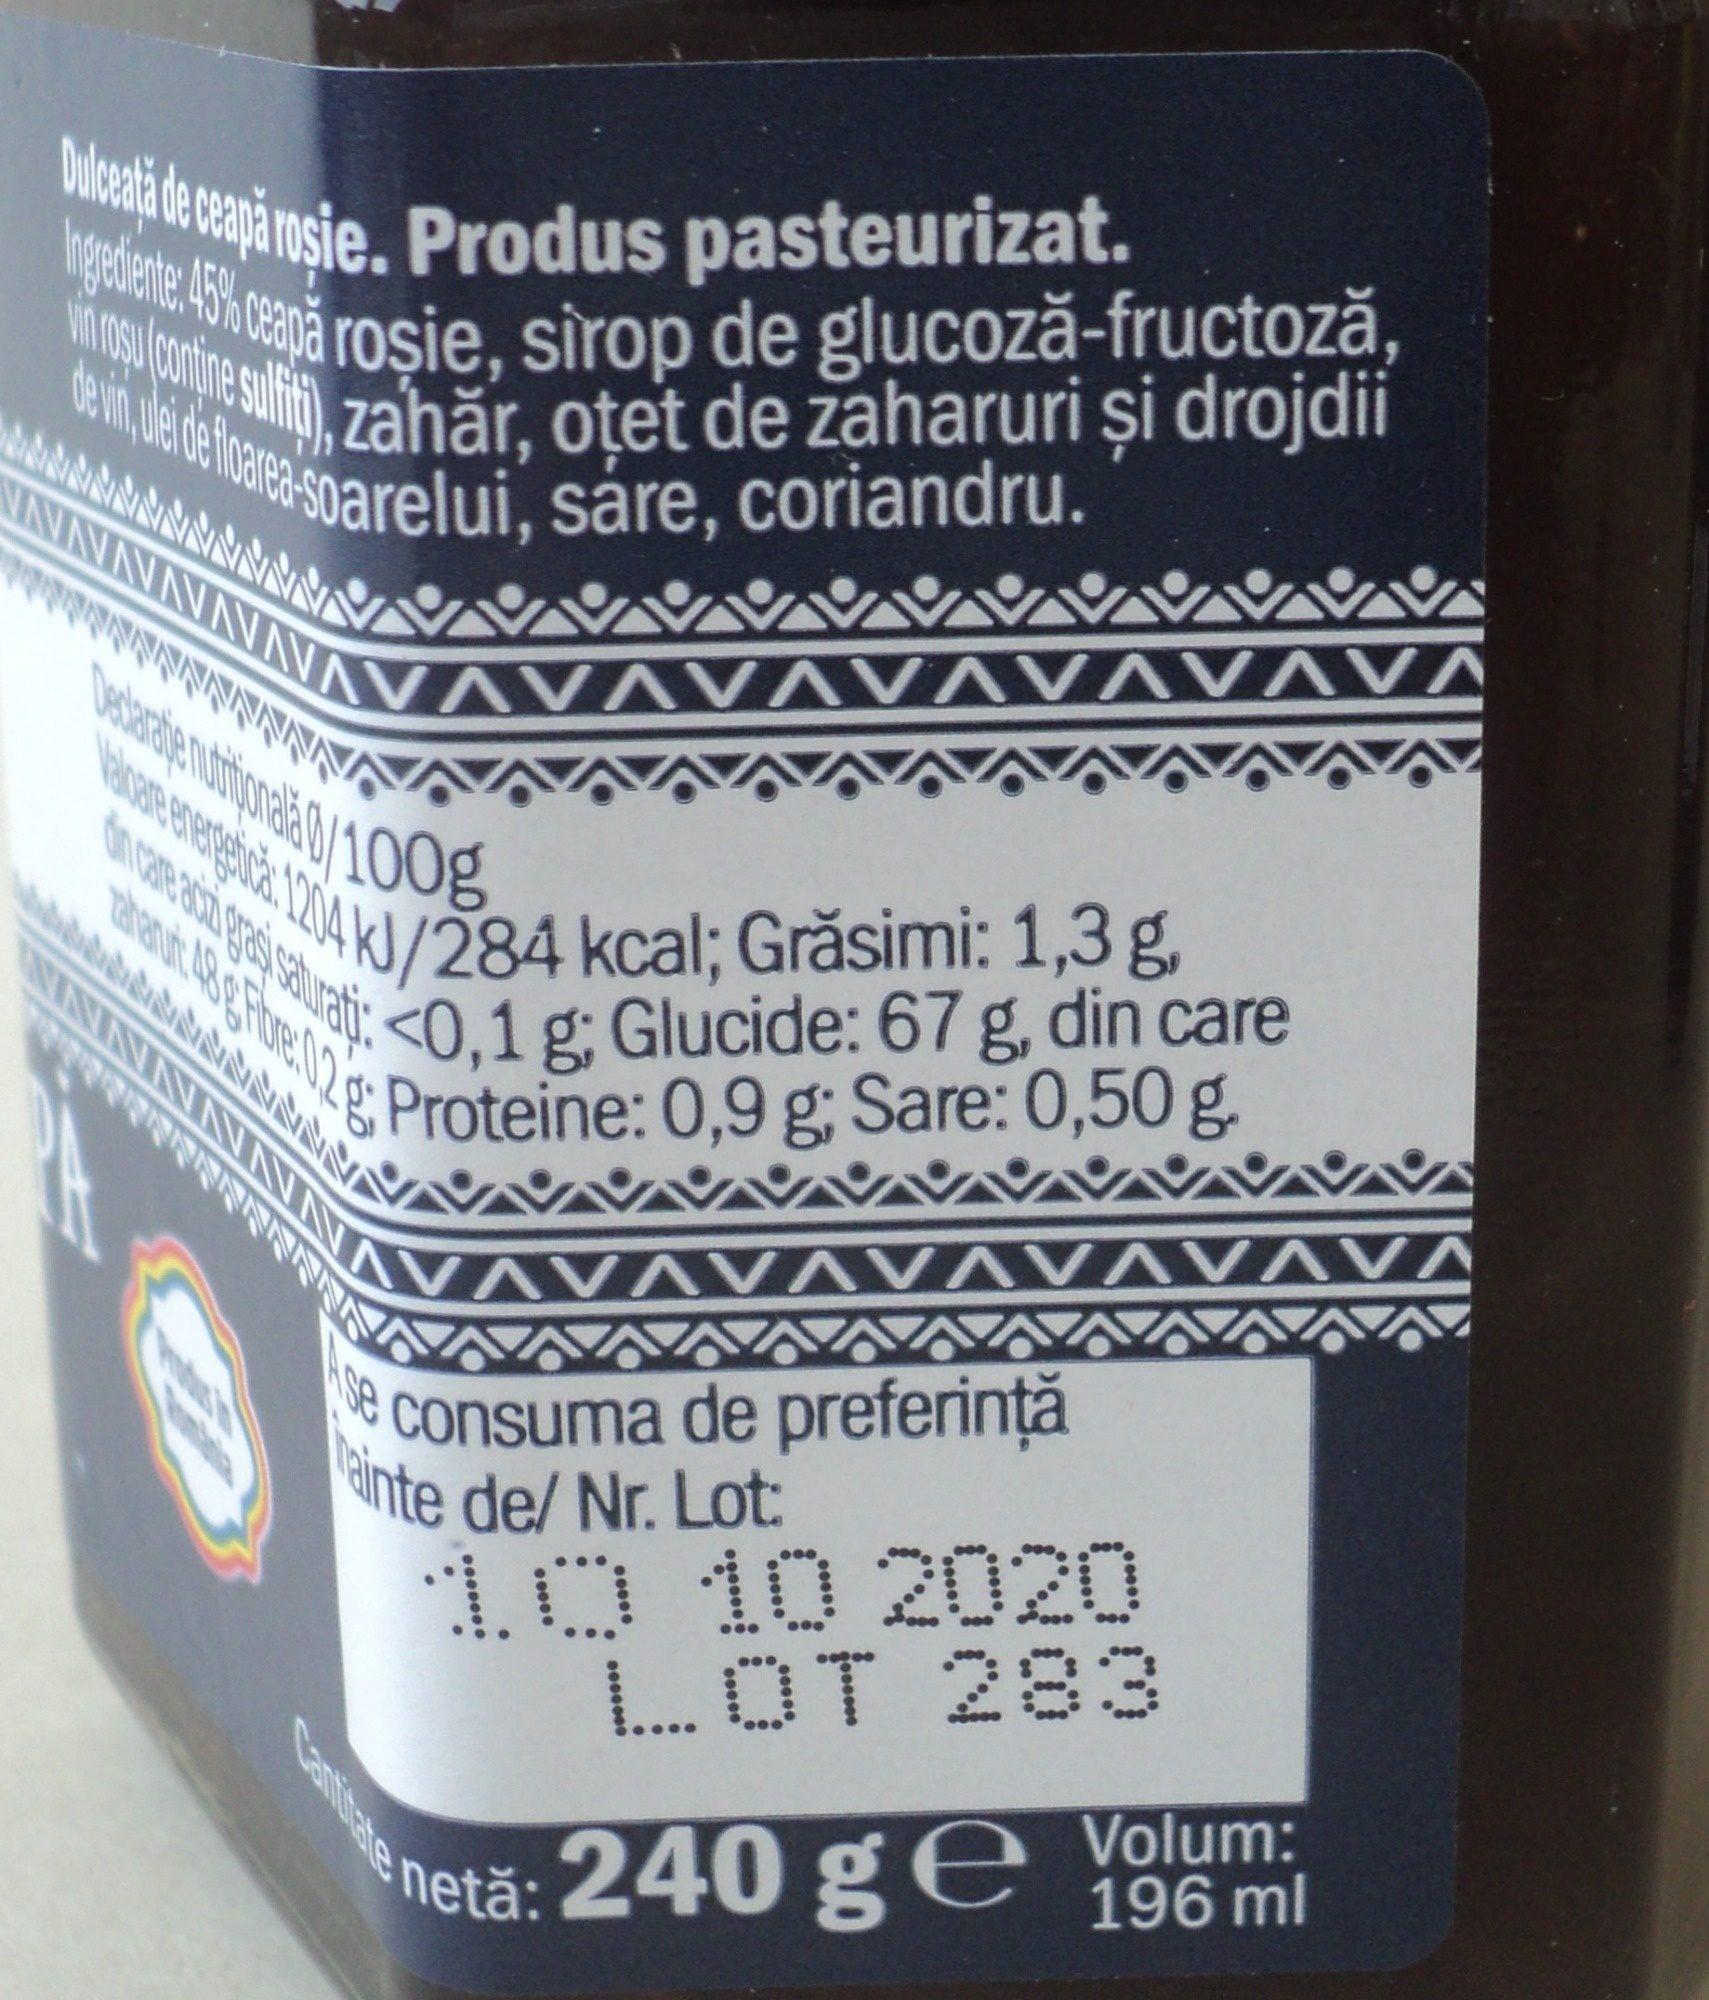 Camara Noastra Dulceata de ceapa rosie - Nutrition facts - ro